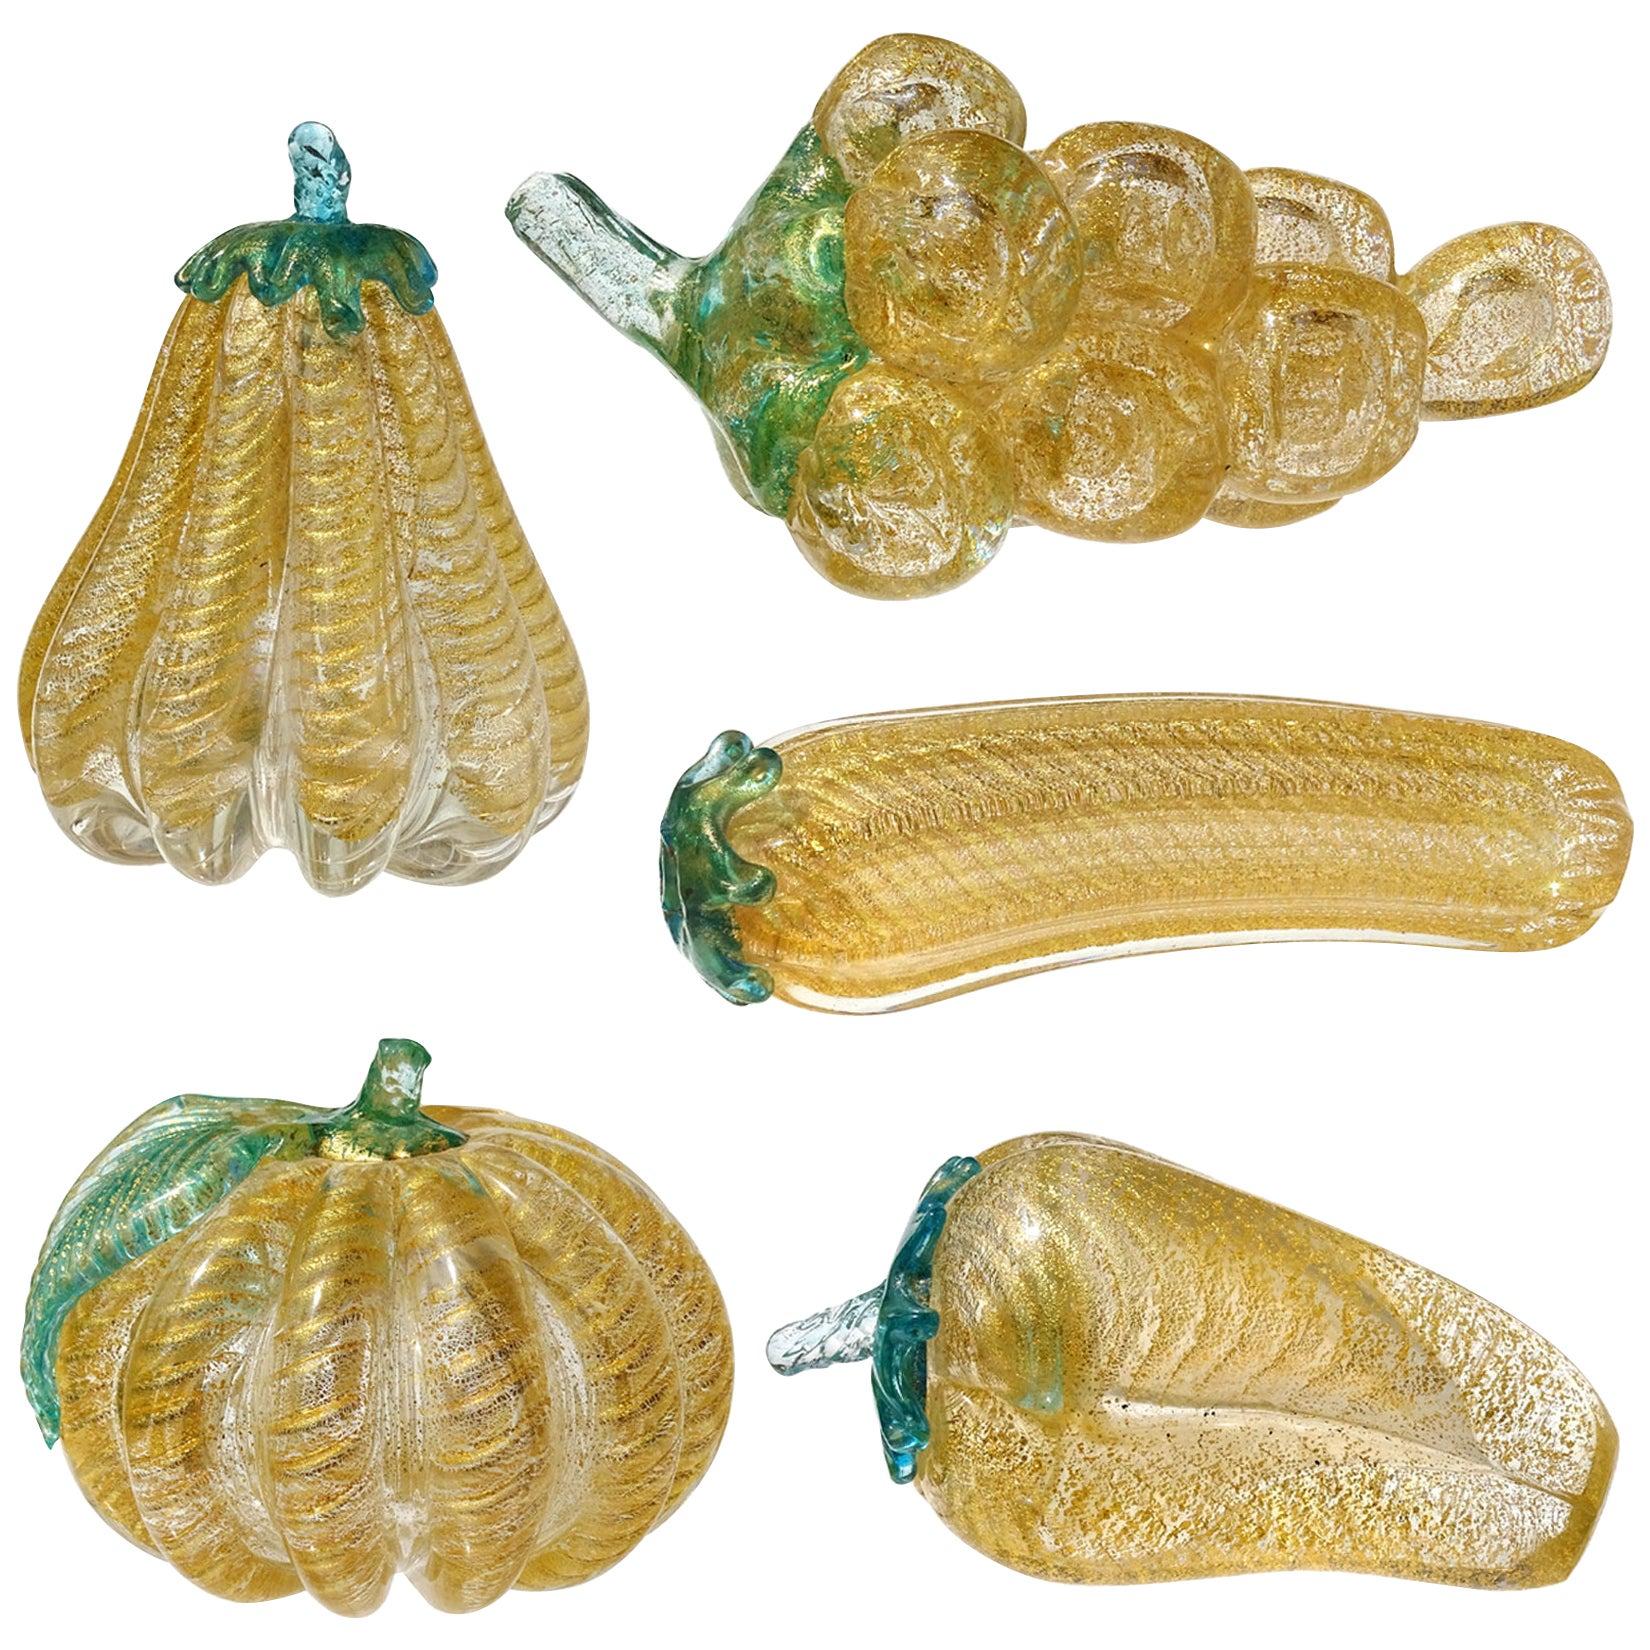 Barovier Toso Murano Gold Flecks Italian Art Glass Grapes Gourds Pepper Fruits